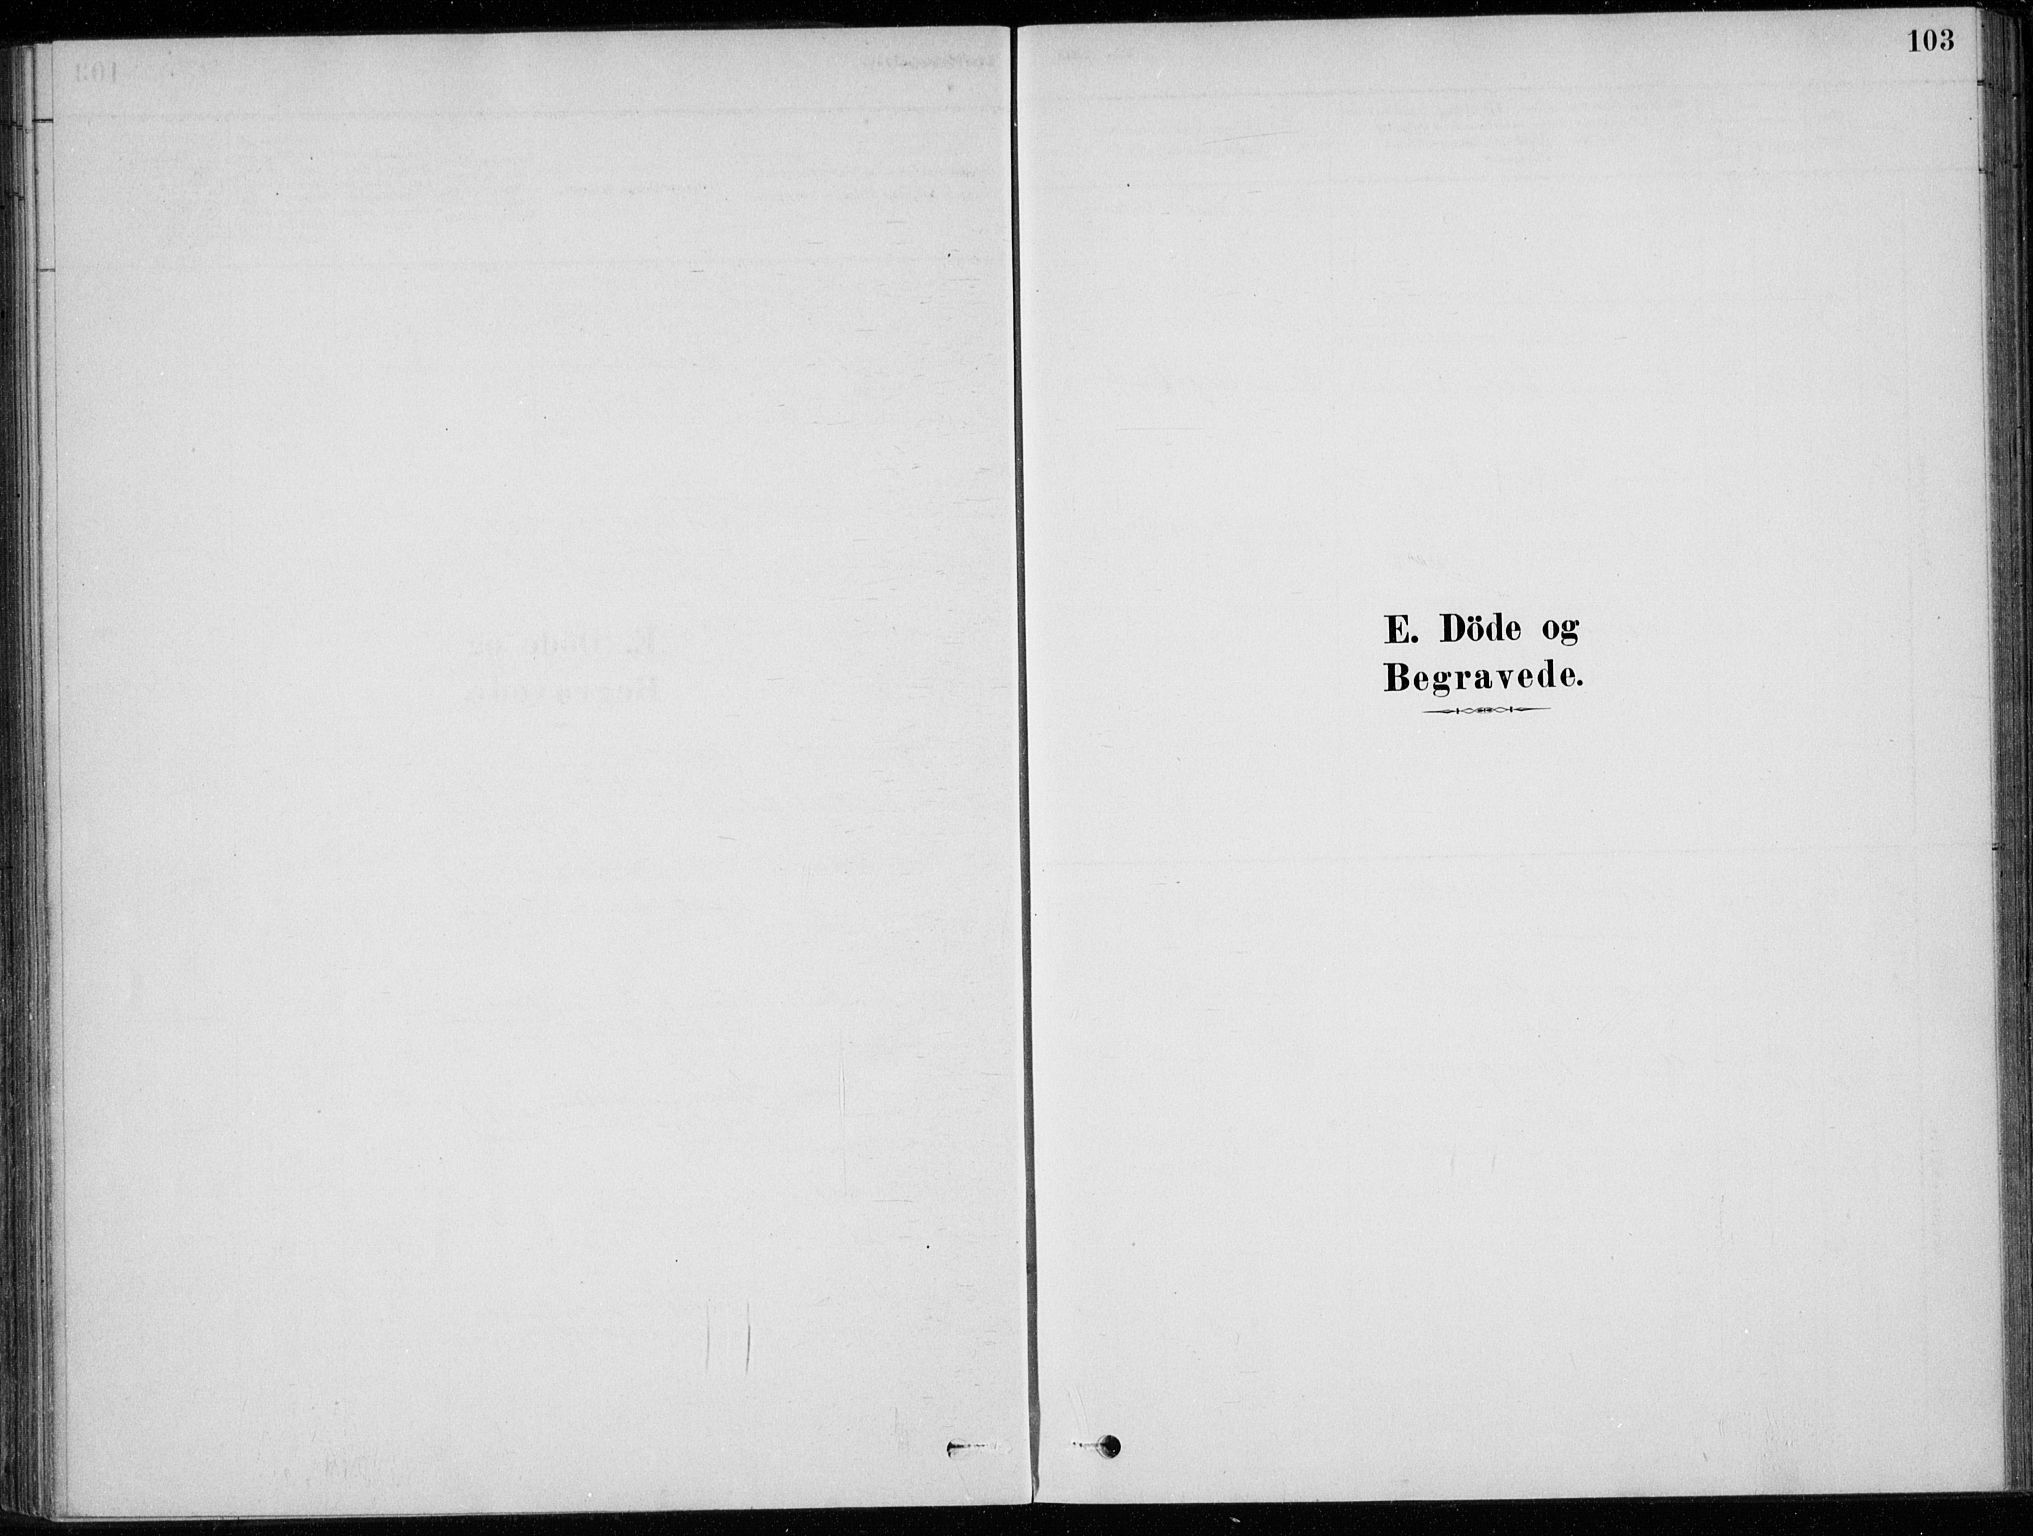 SAKO, Sigdal kirkebøker, F/Fc/L0001: Ministerialbok nr. III 1, 1879-1893, s. 103